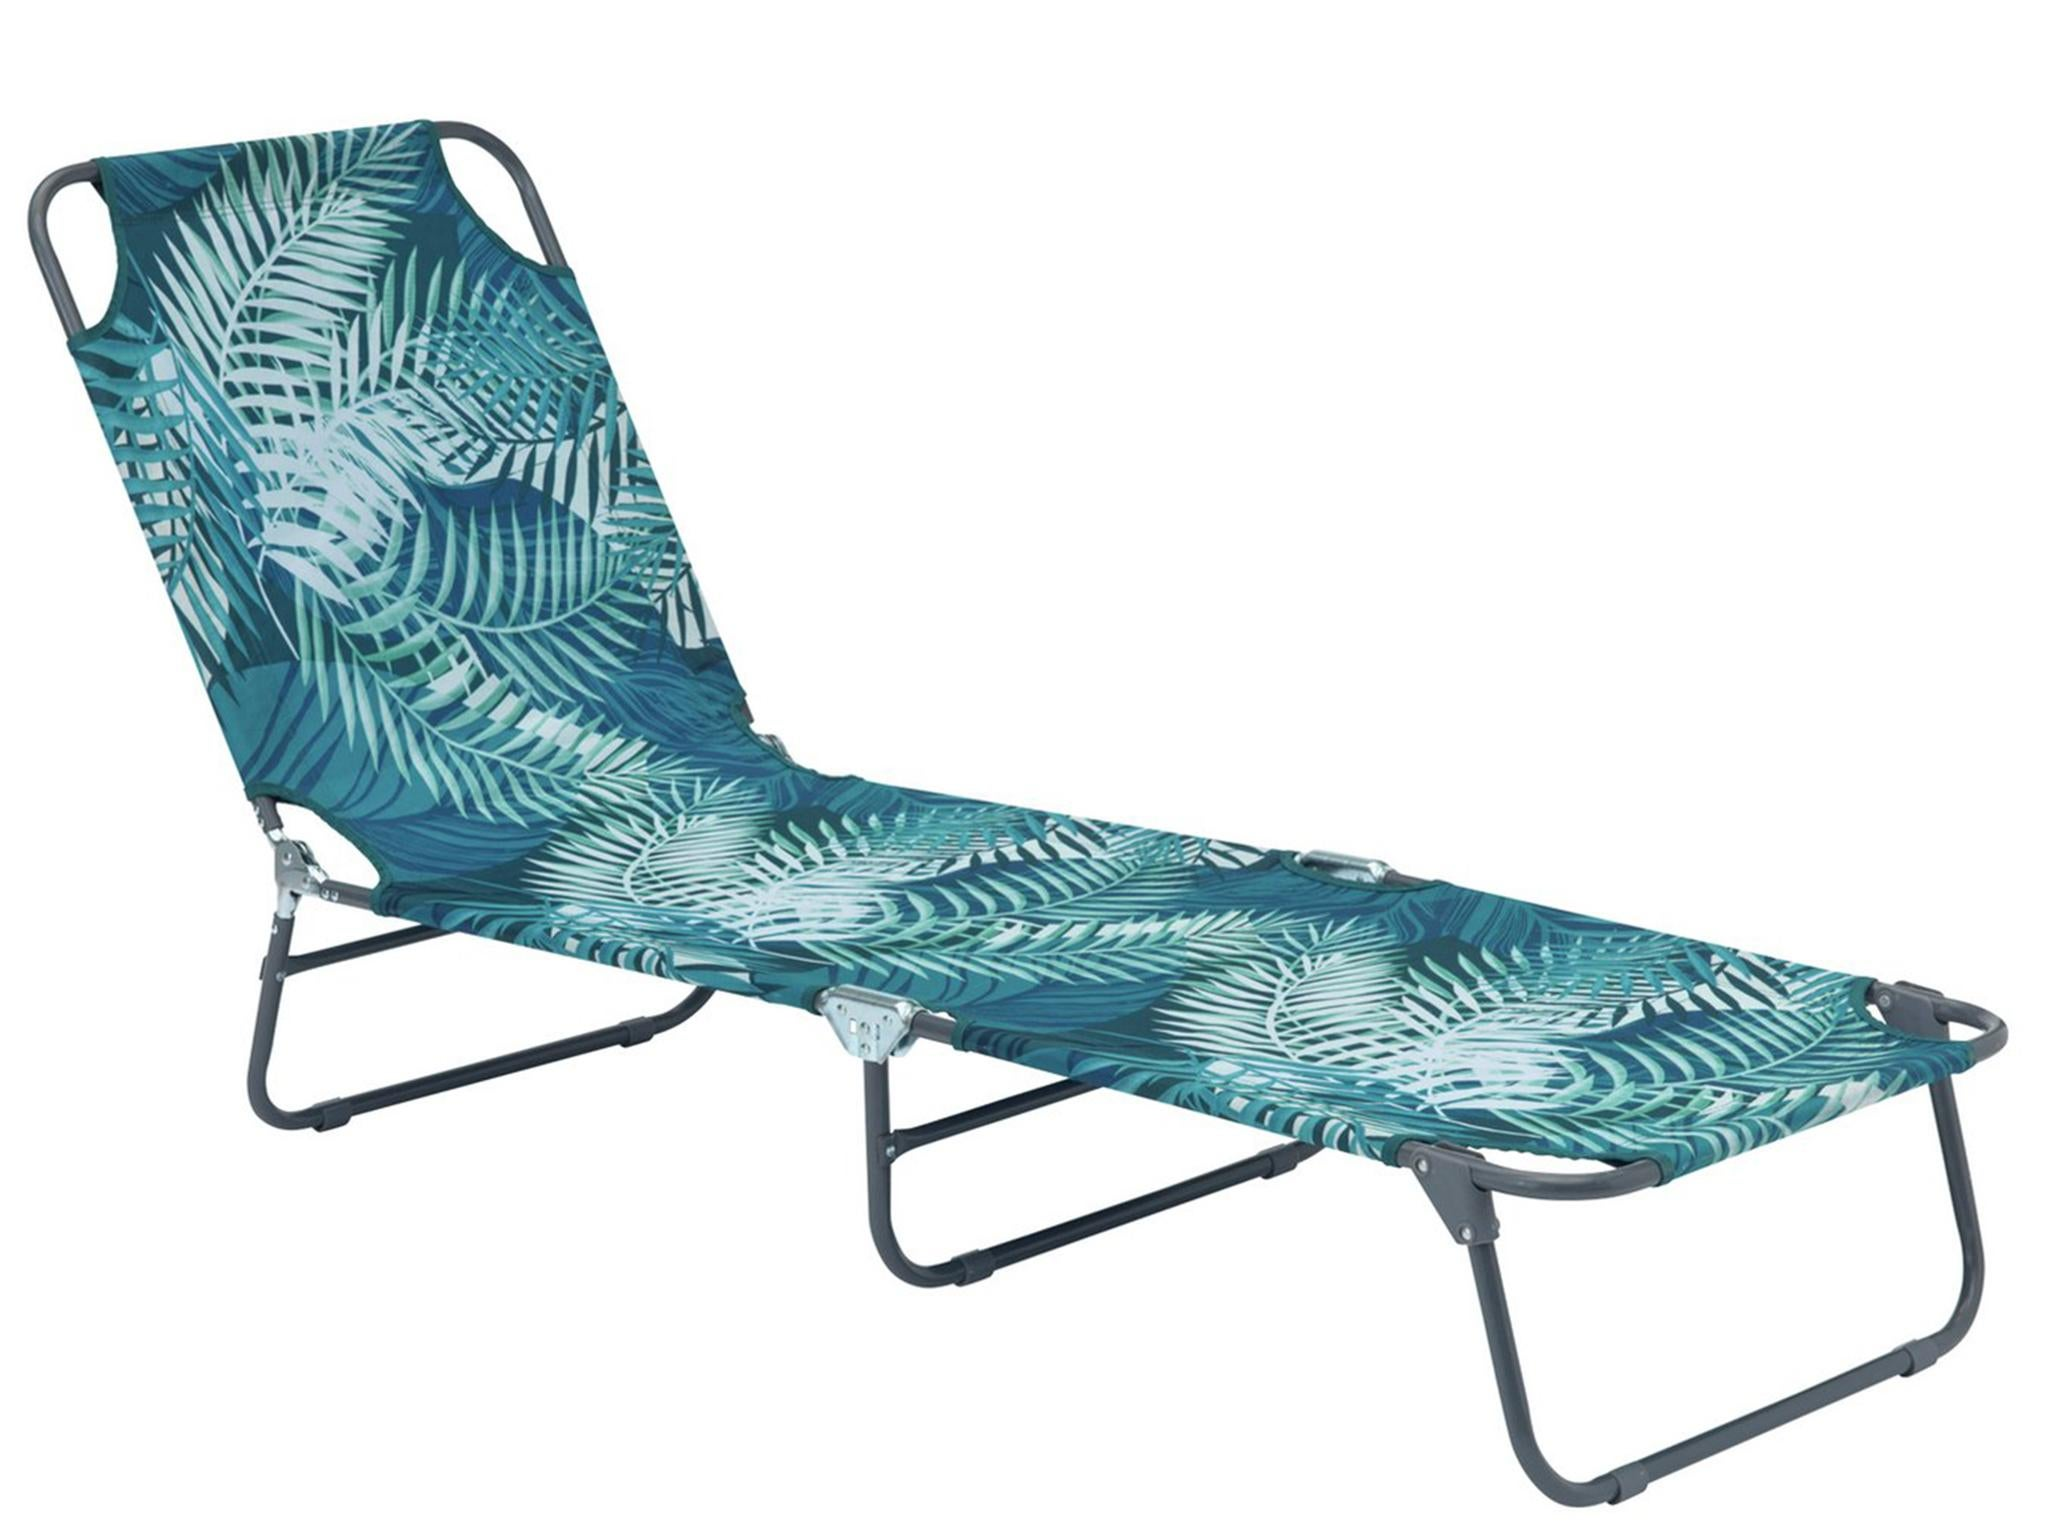 chaise sofa sleeper, chaise recliner chair, chaise furniture, on garden chaise longue uk